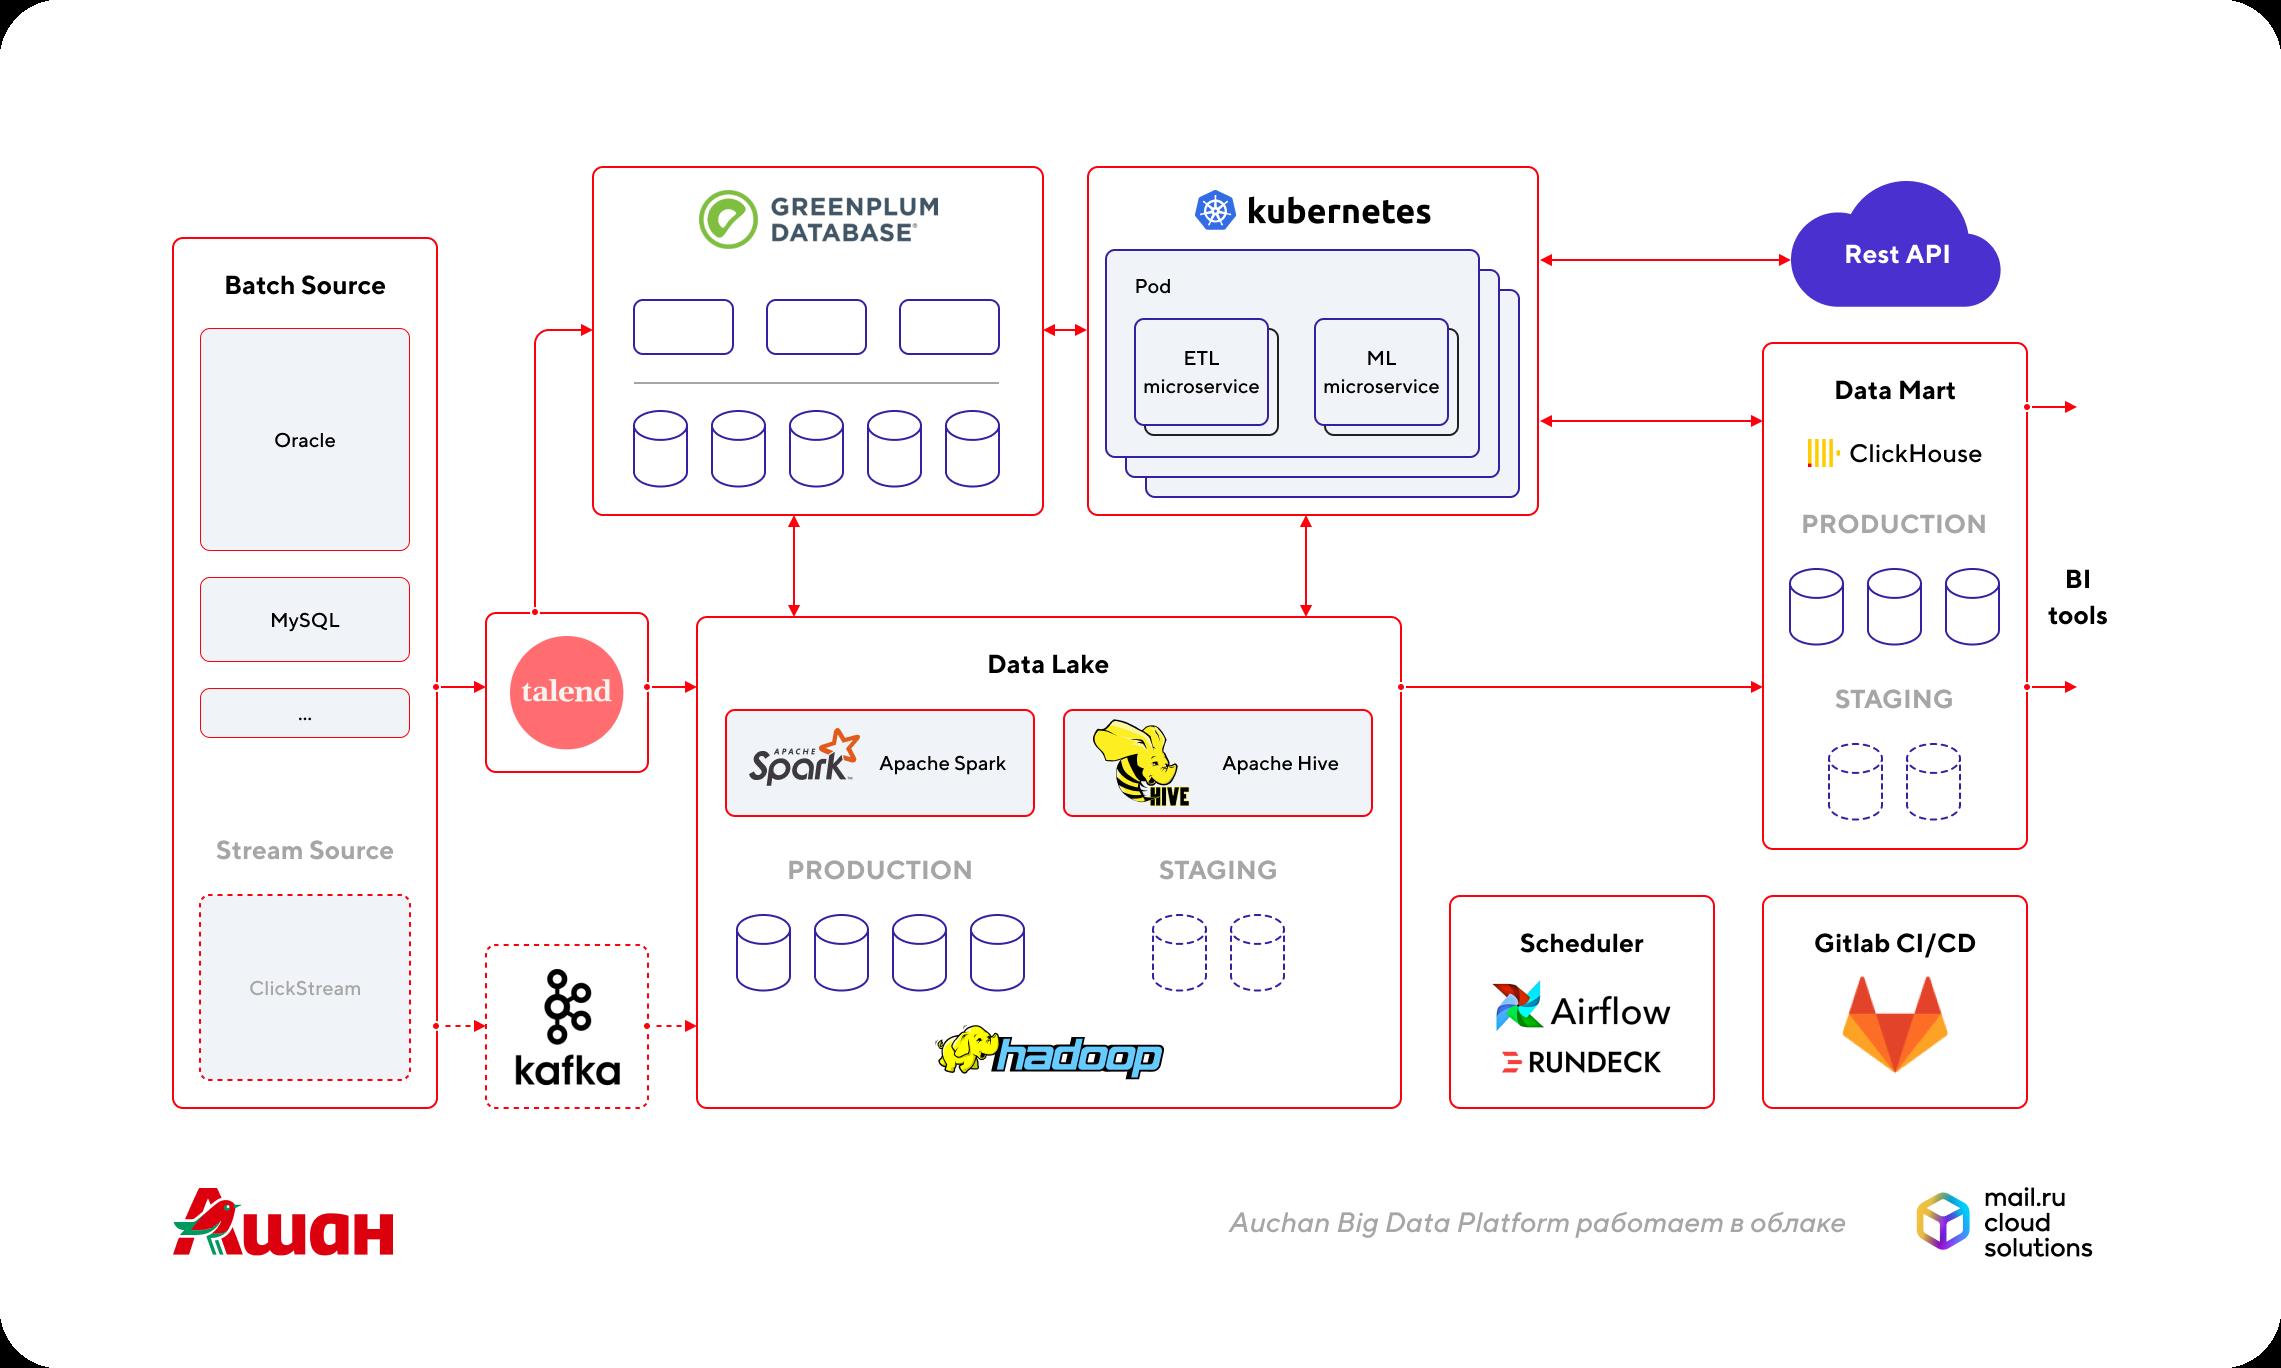 Auchan Big Data Platform